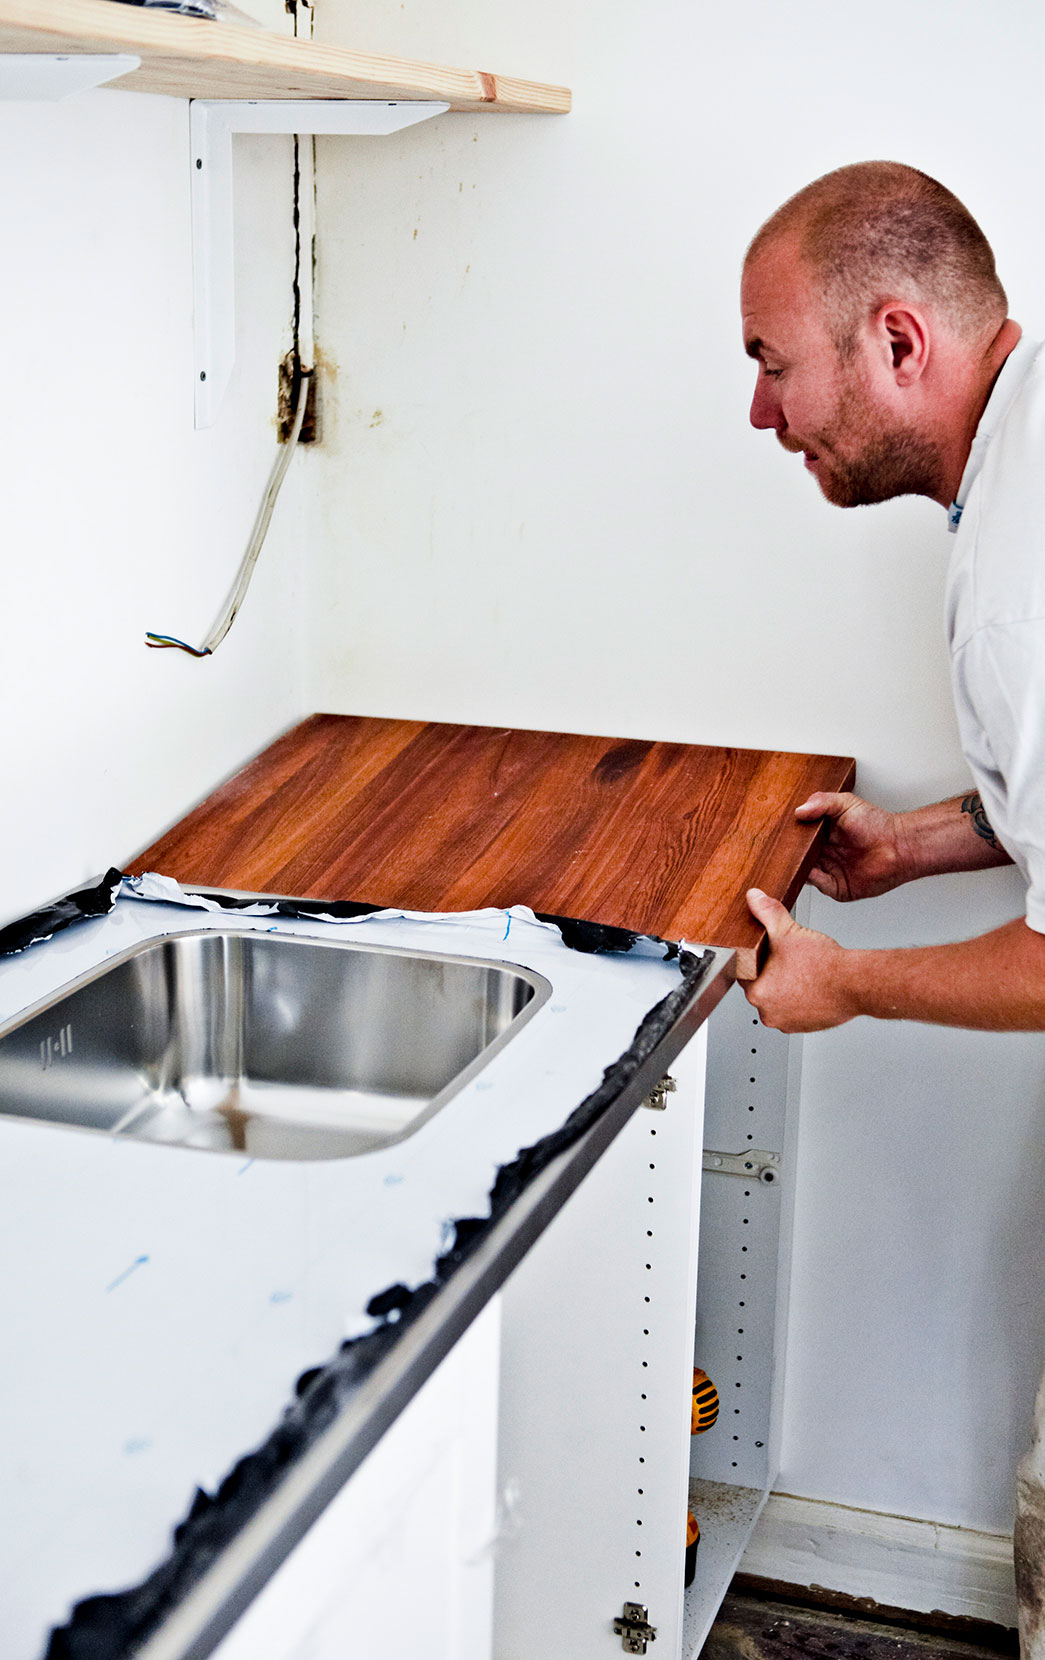 Det sidste stykke bordplade monteres